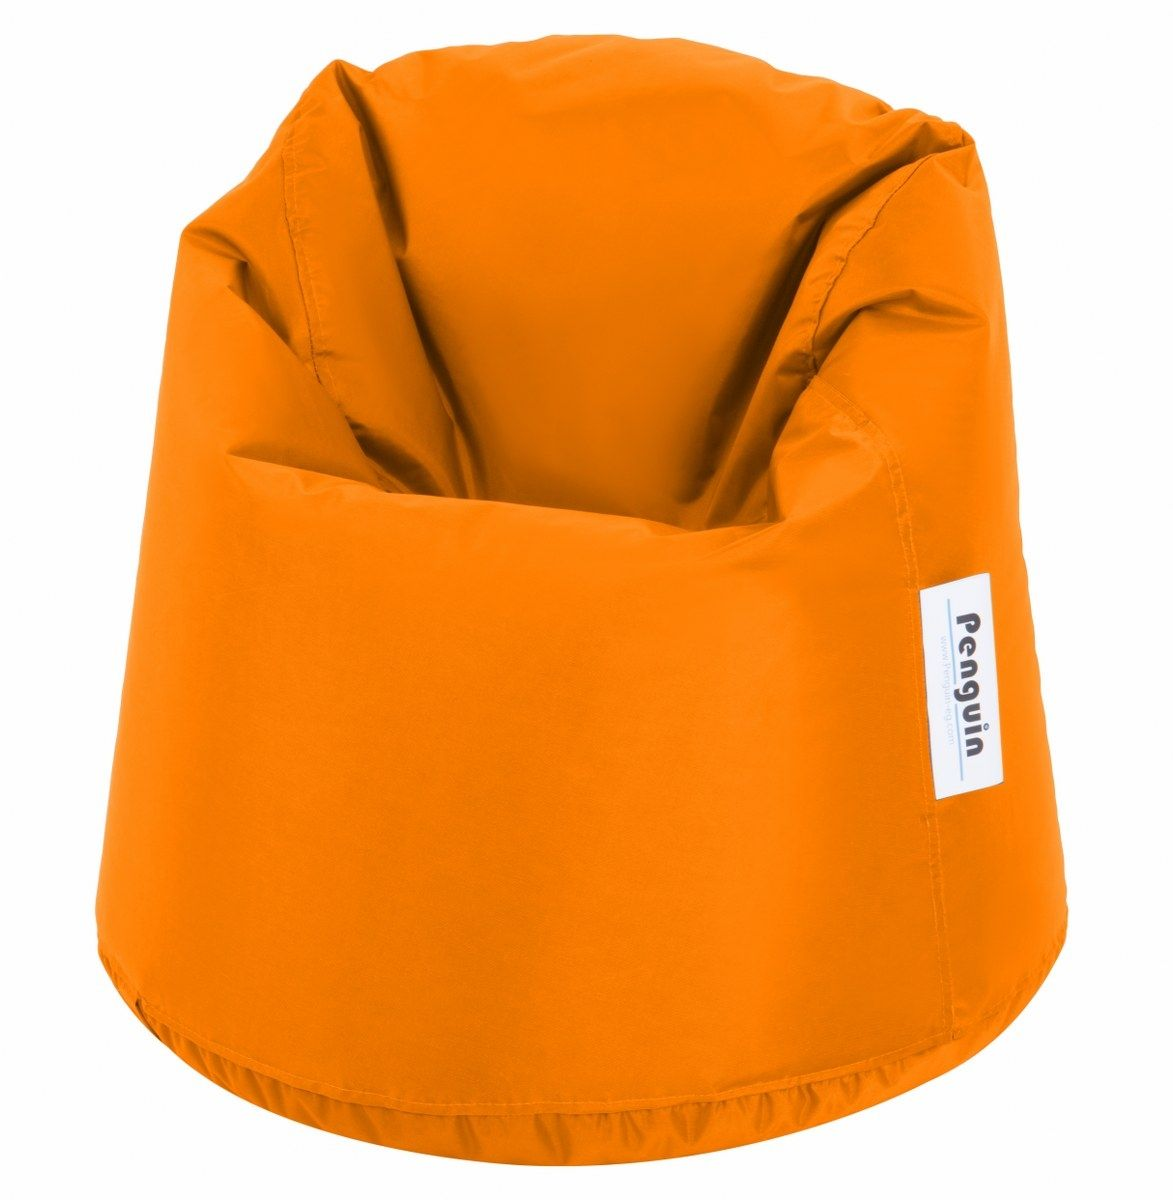 Pleasant Penguin Waterproof Baby Bean Bag 60 40 Orange Price In Machost Co Dining Chair Design Ideas Machostcouk